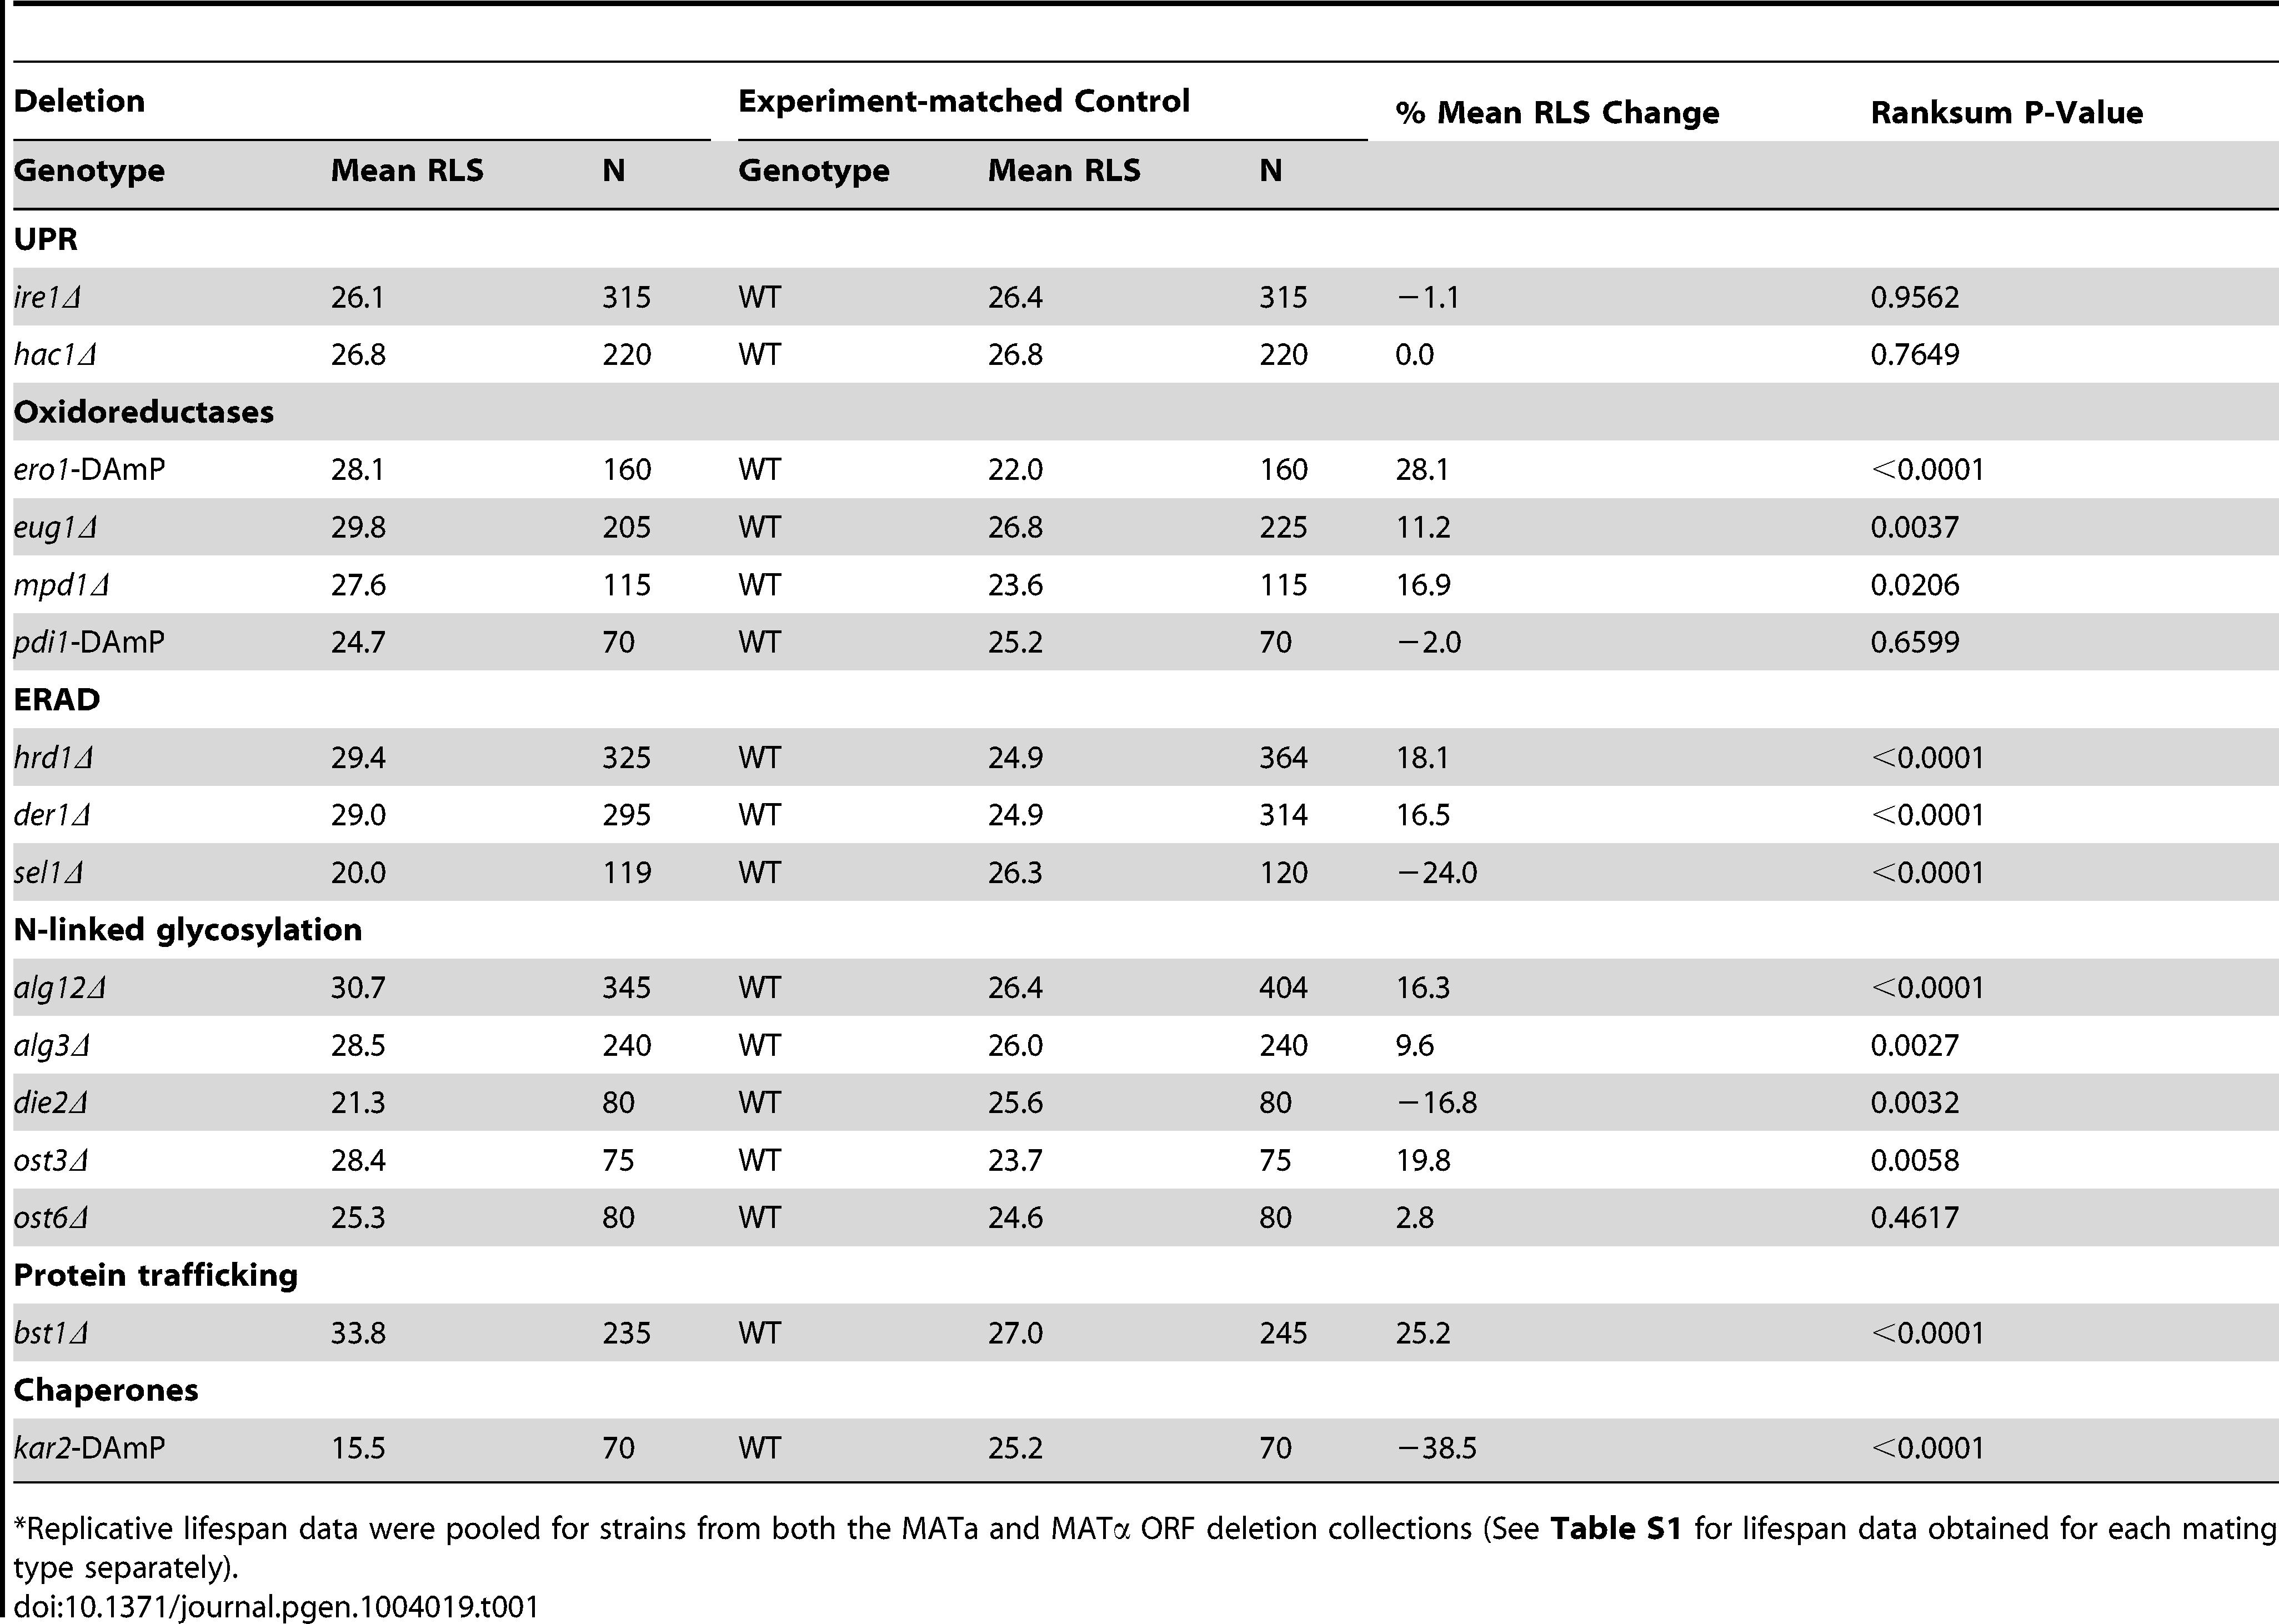 Regulation of lifespan by ER stress response mutants<em class=&quot;ref&quot;>*</em>.